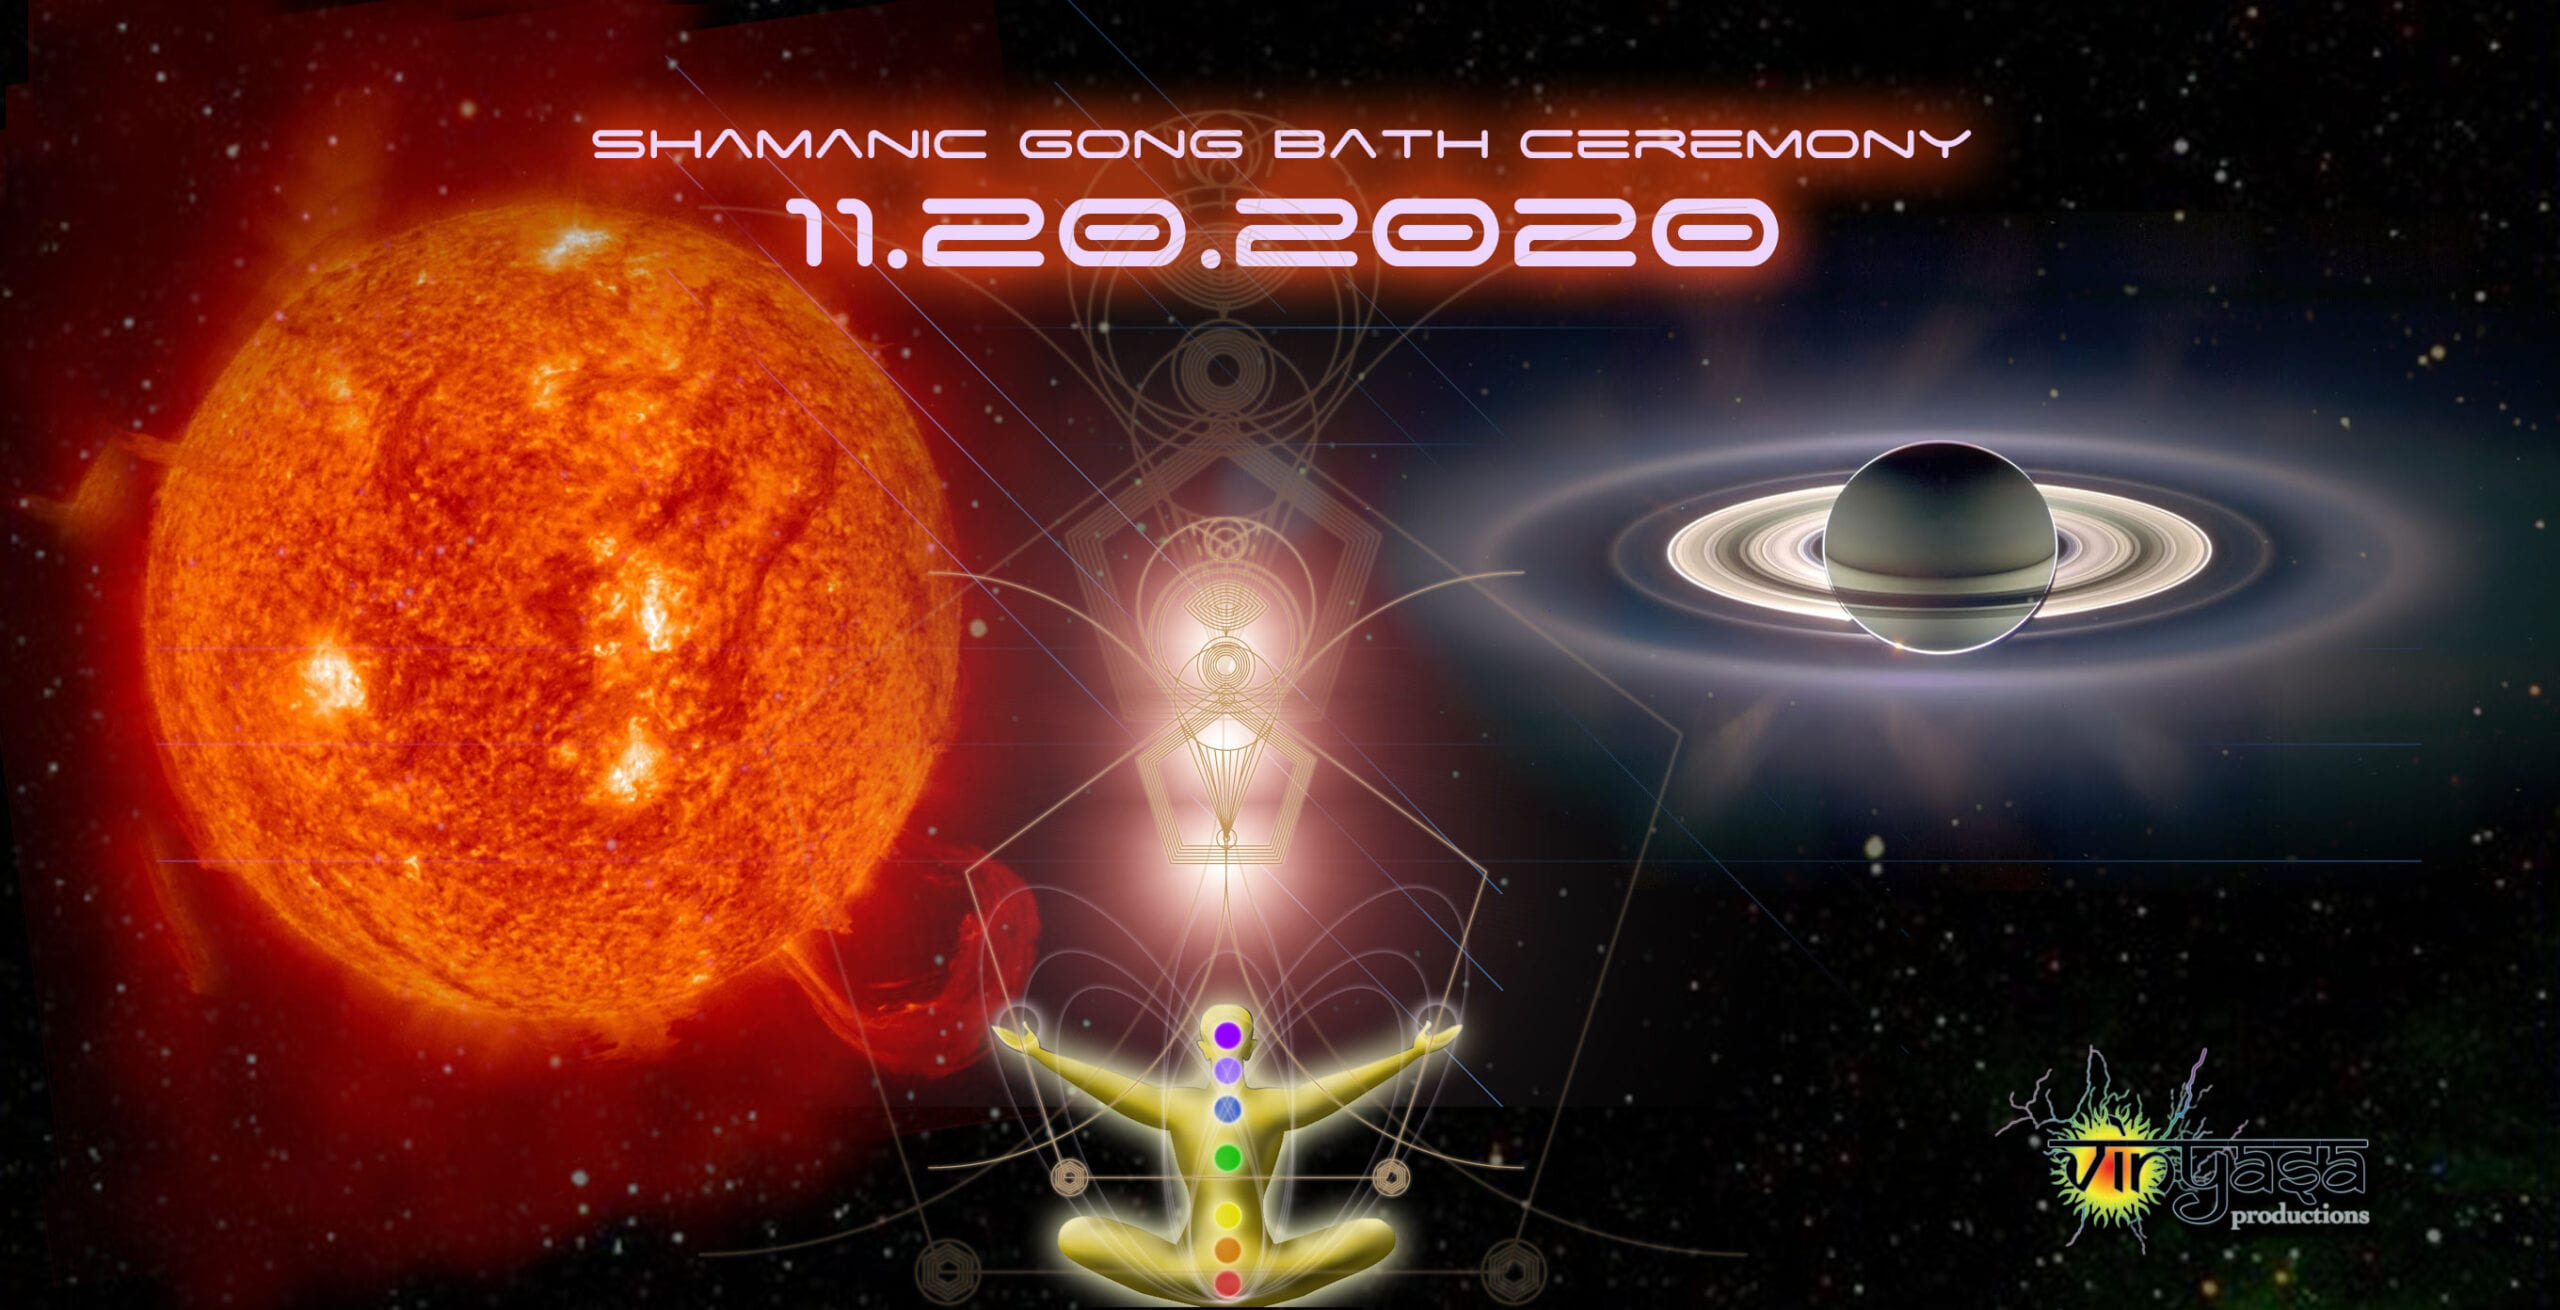 November 20, 2020 Gong Bath